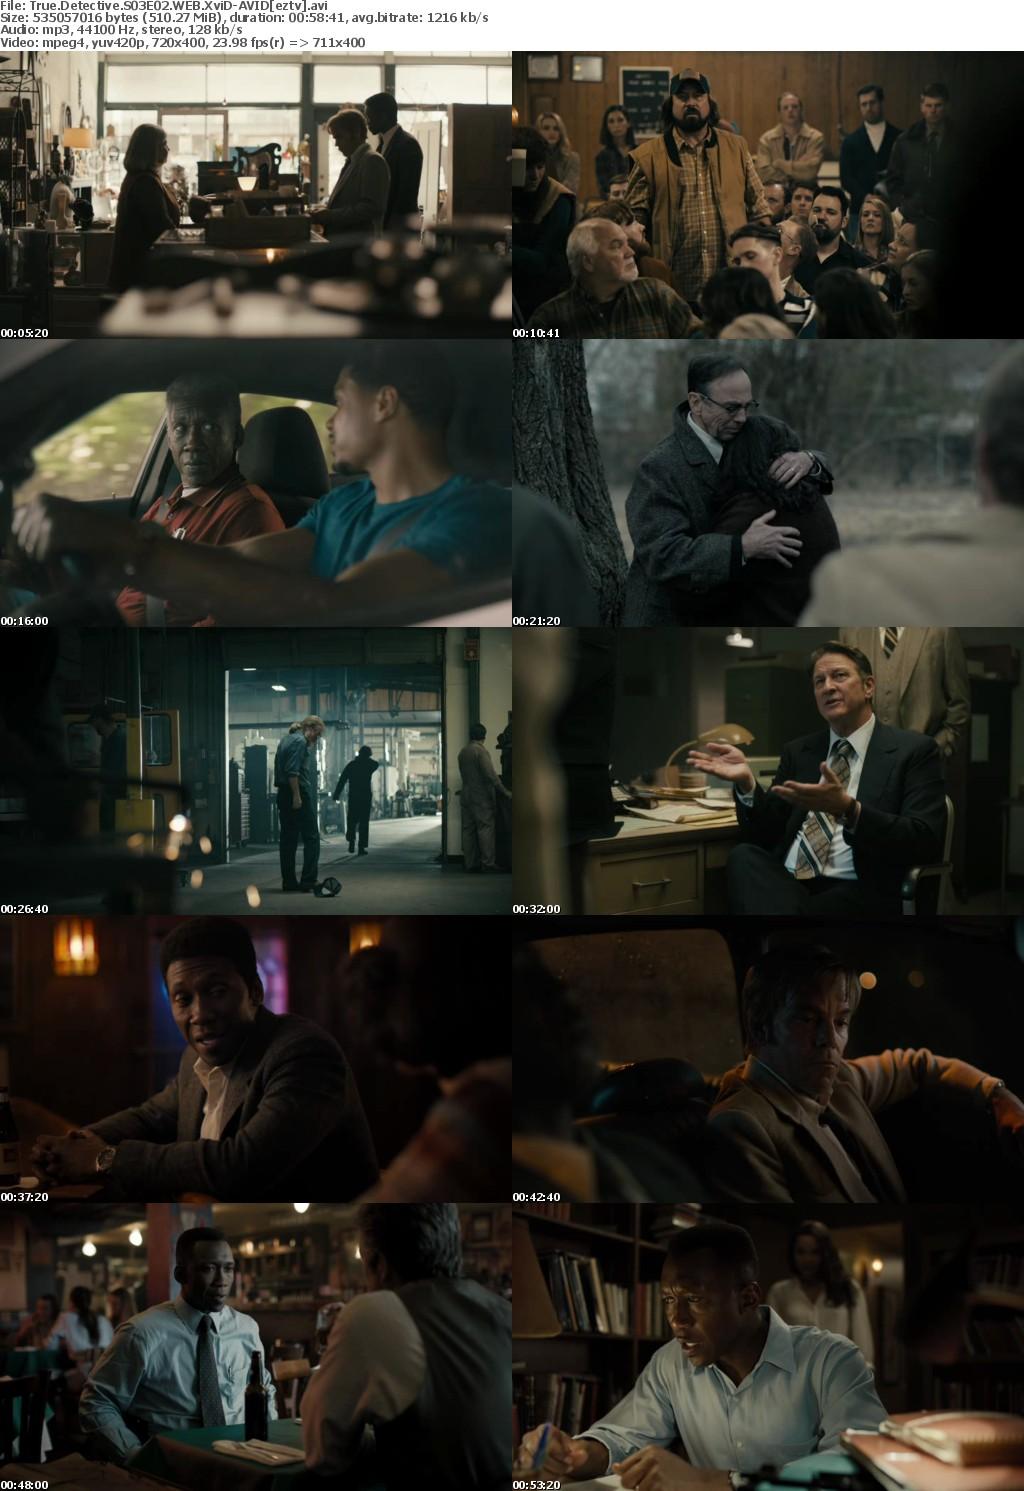 True Detective S03E02 WEB XviD-AVID